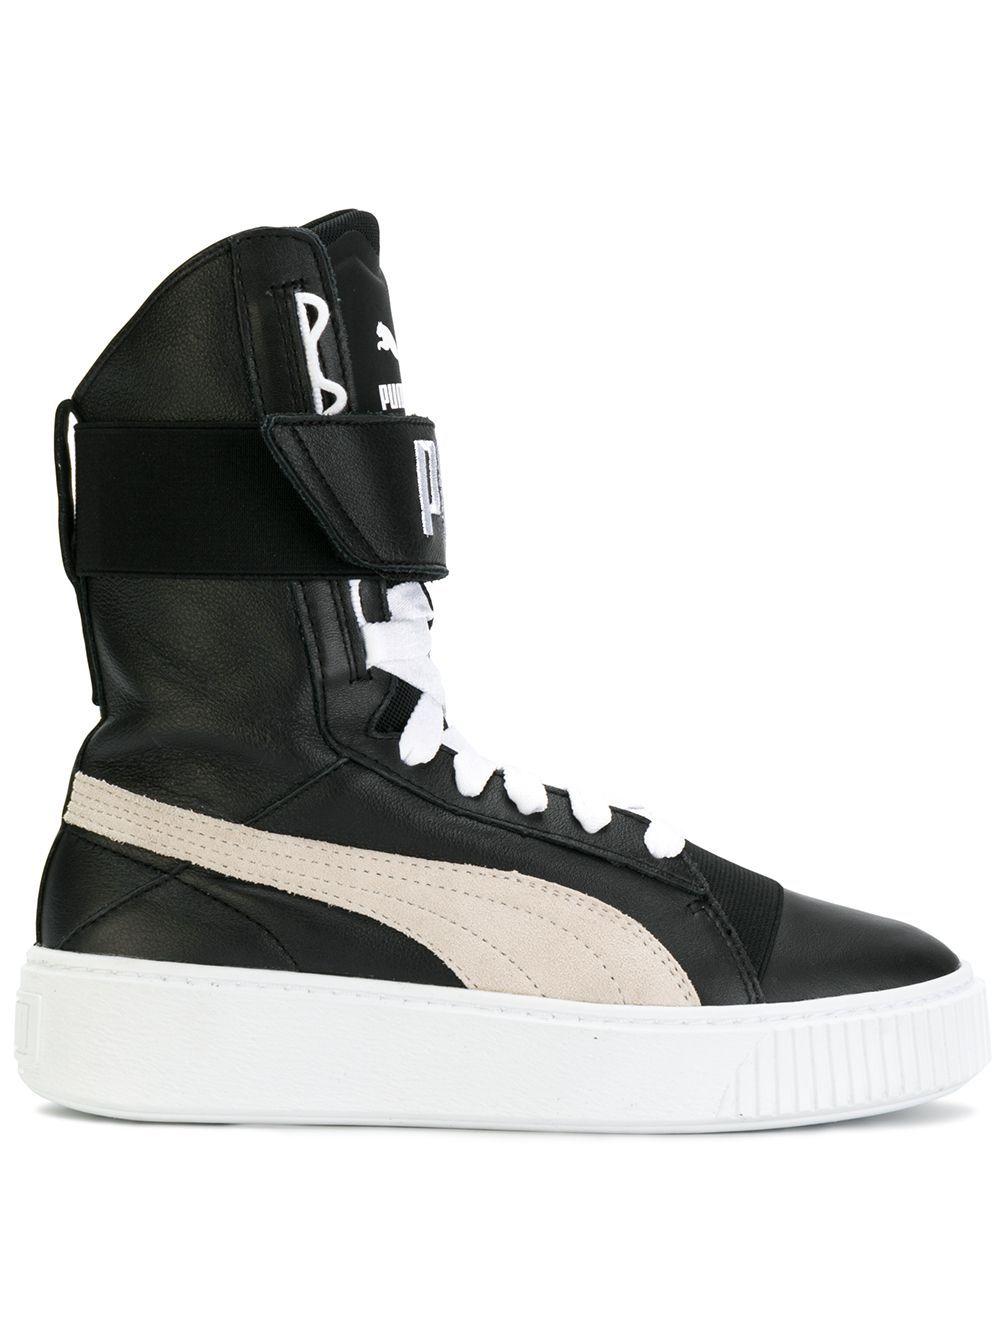 PUMA | platform boots #Shoes #PUMA in 2019 | Puma sneakers